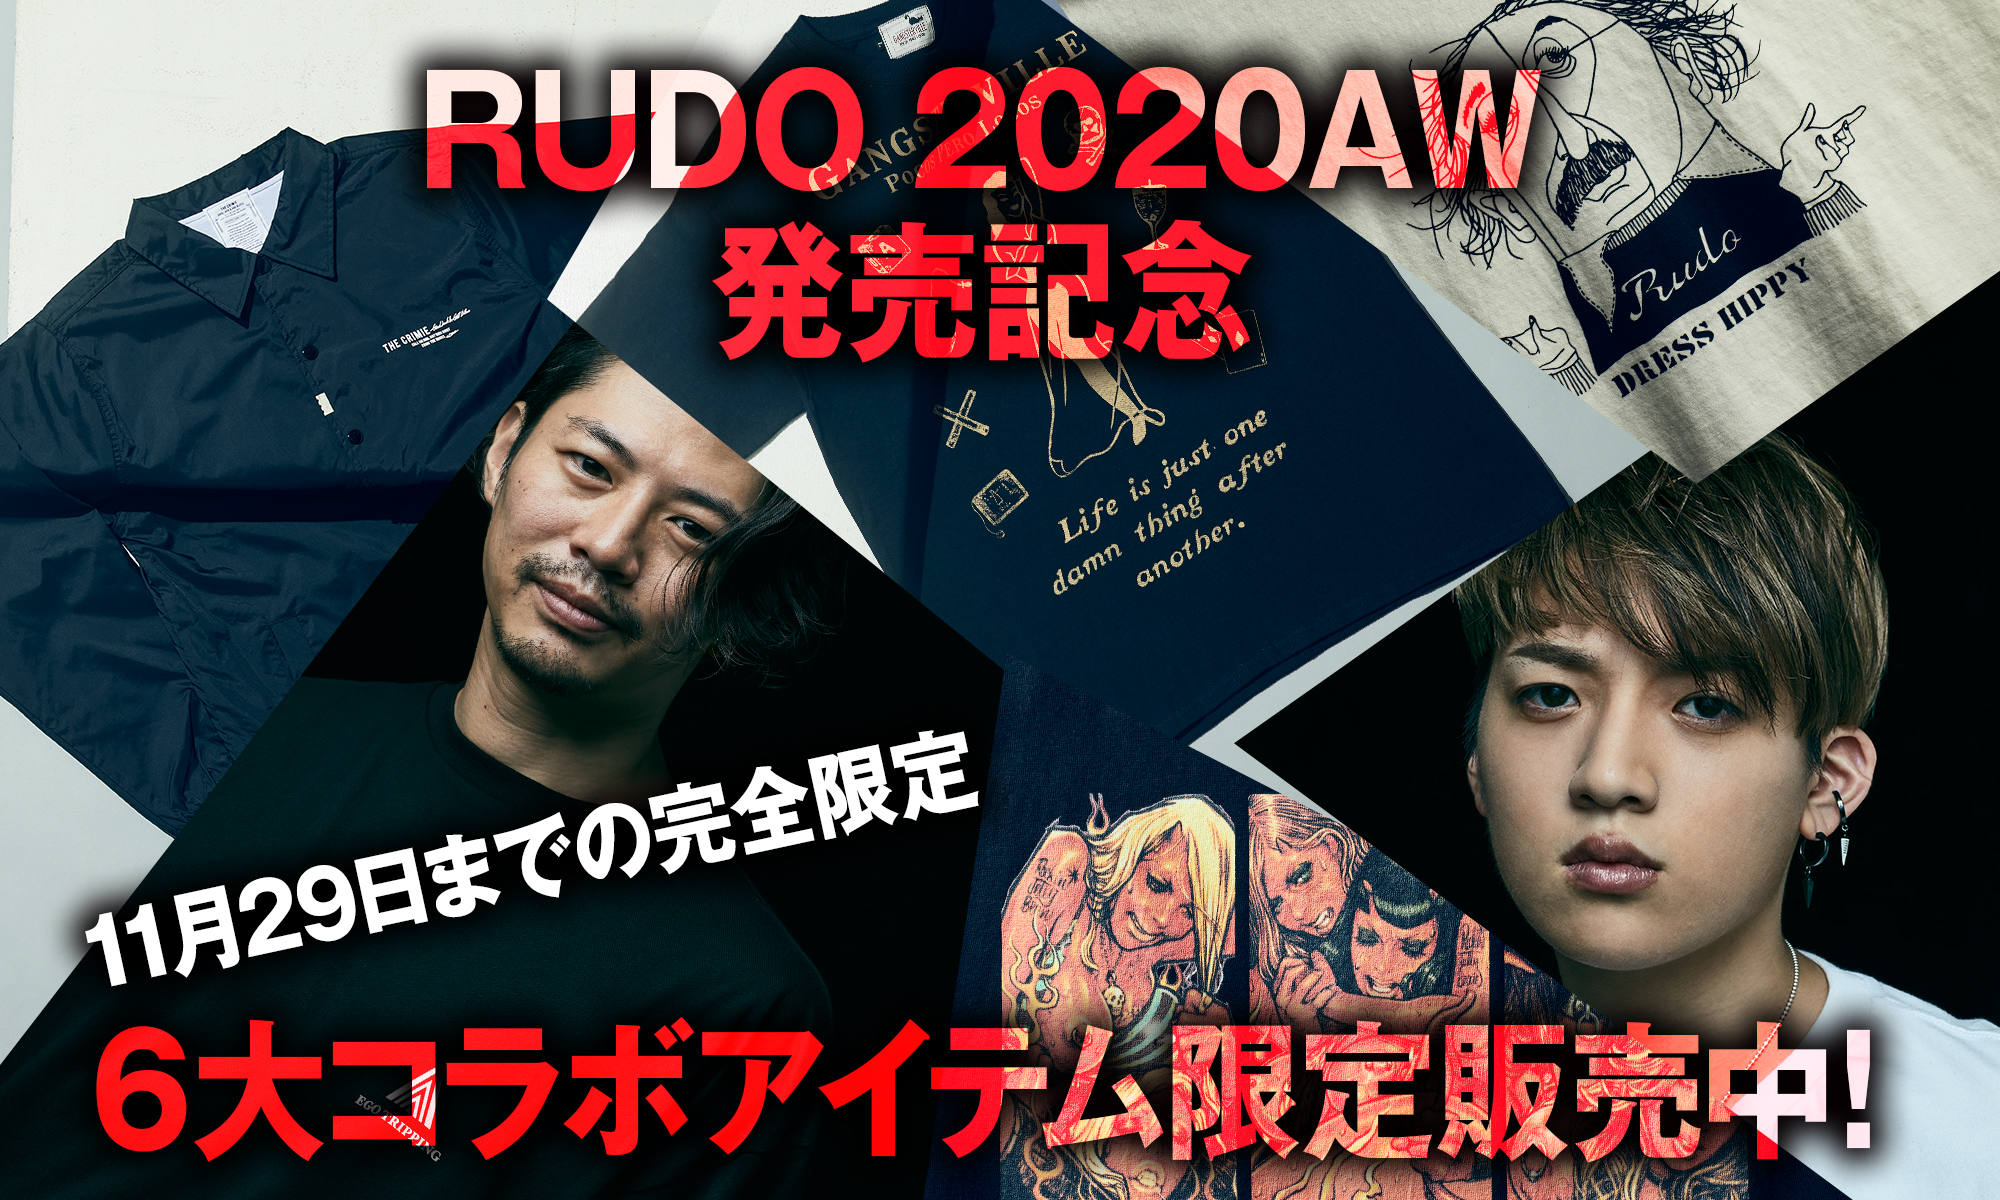 RUDO 2020AW発売記念 コラボアイテム販売中